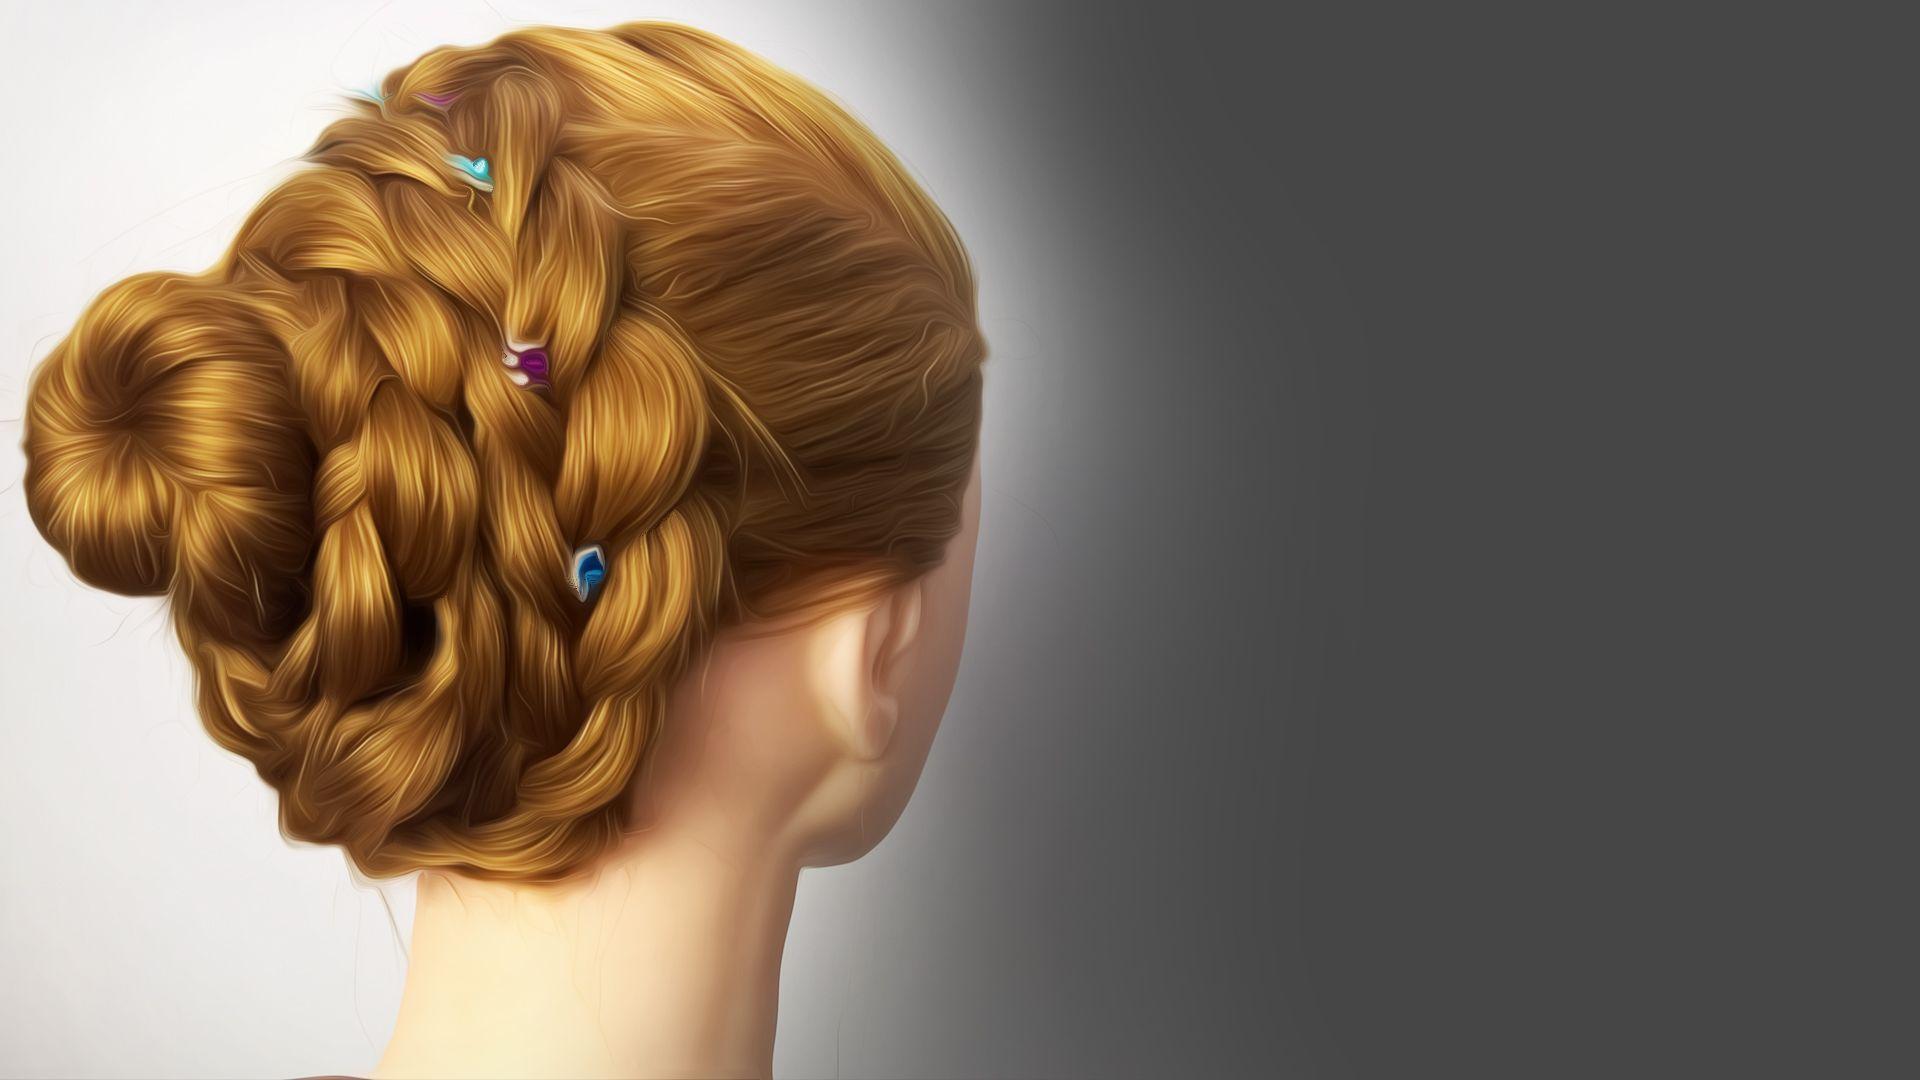 Rose Bun Hairstyle Learn Flower Juda Hairstyle Beauty Girlshairstyle Bun Bun Hairstyles Rose Bun Hairstyle